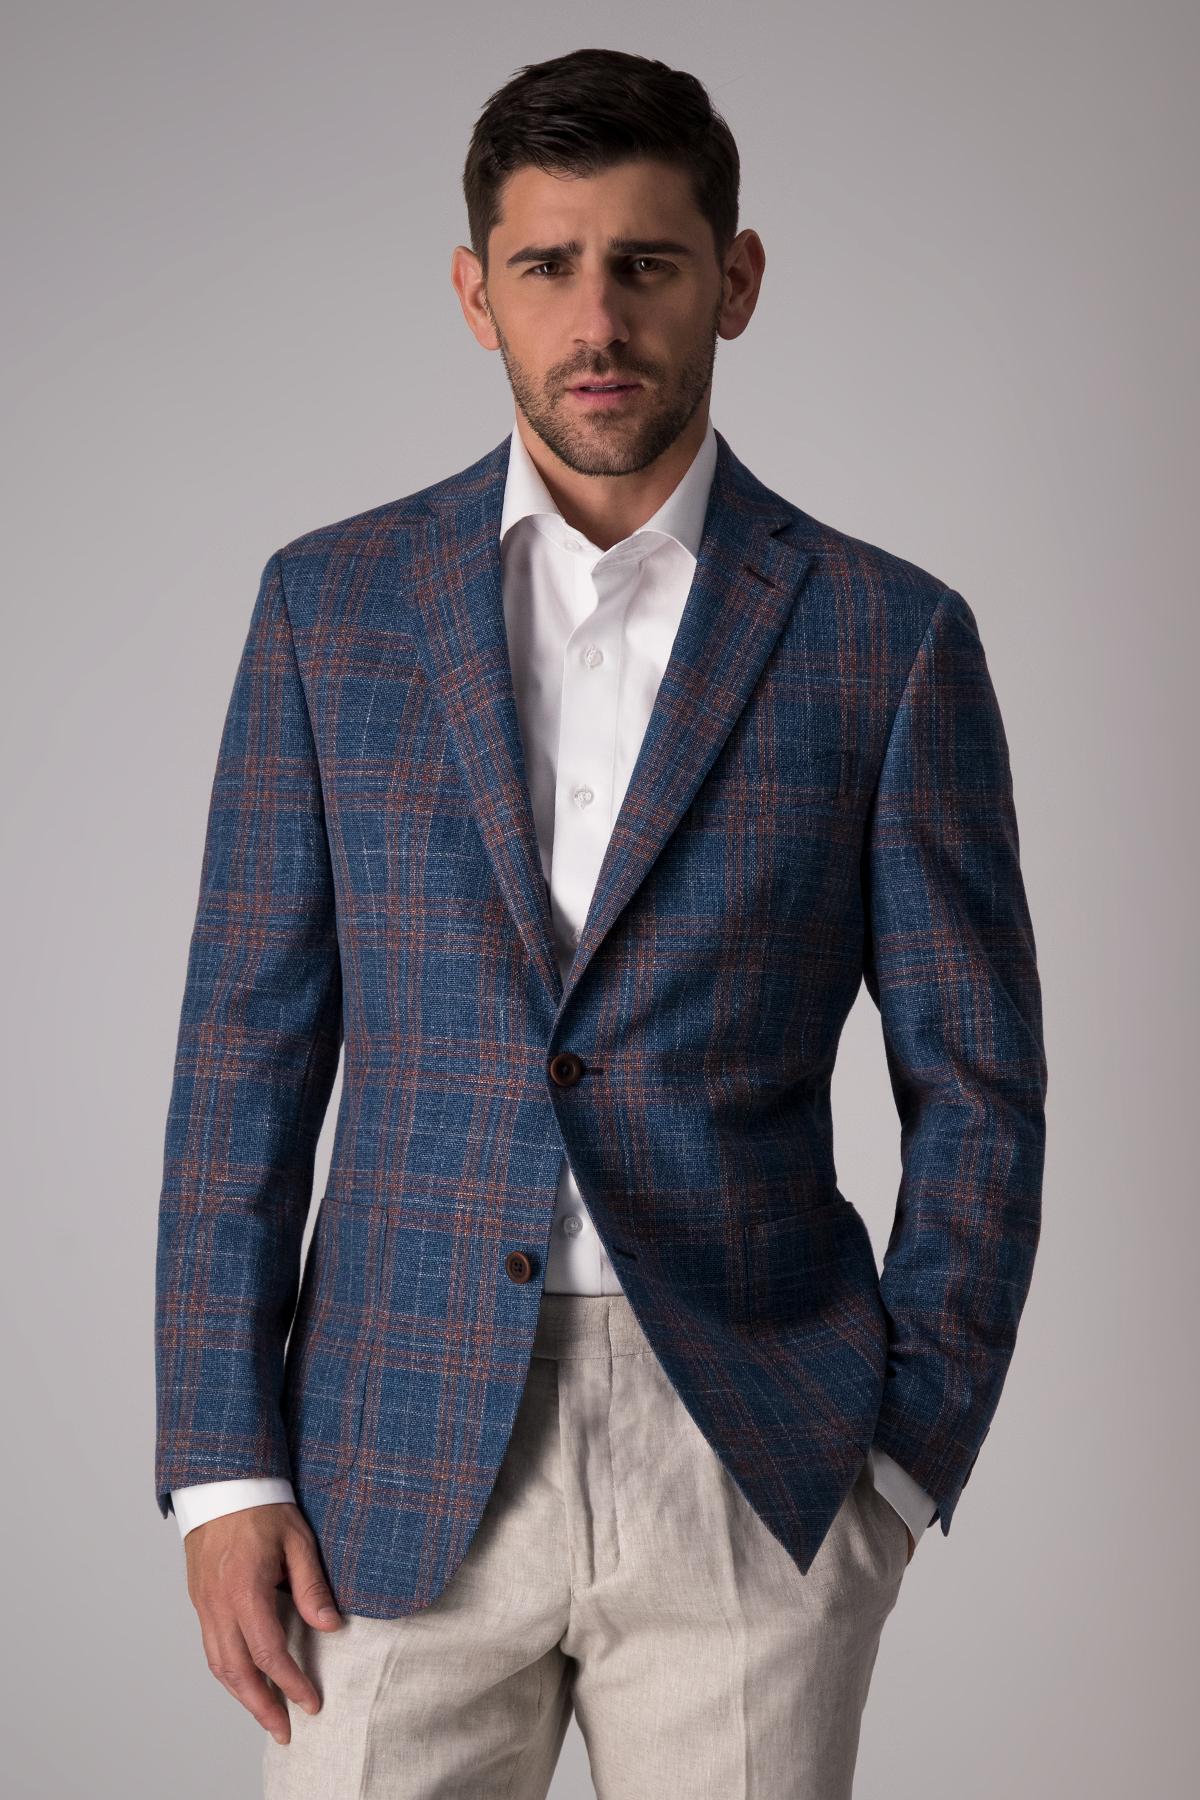 Saco Calderoni tela italiana, azul fantasía,  Regular fit.